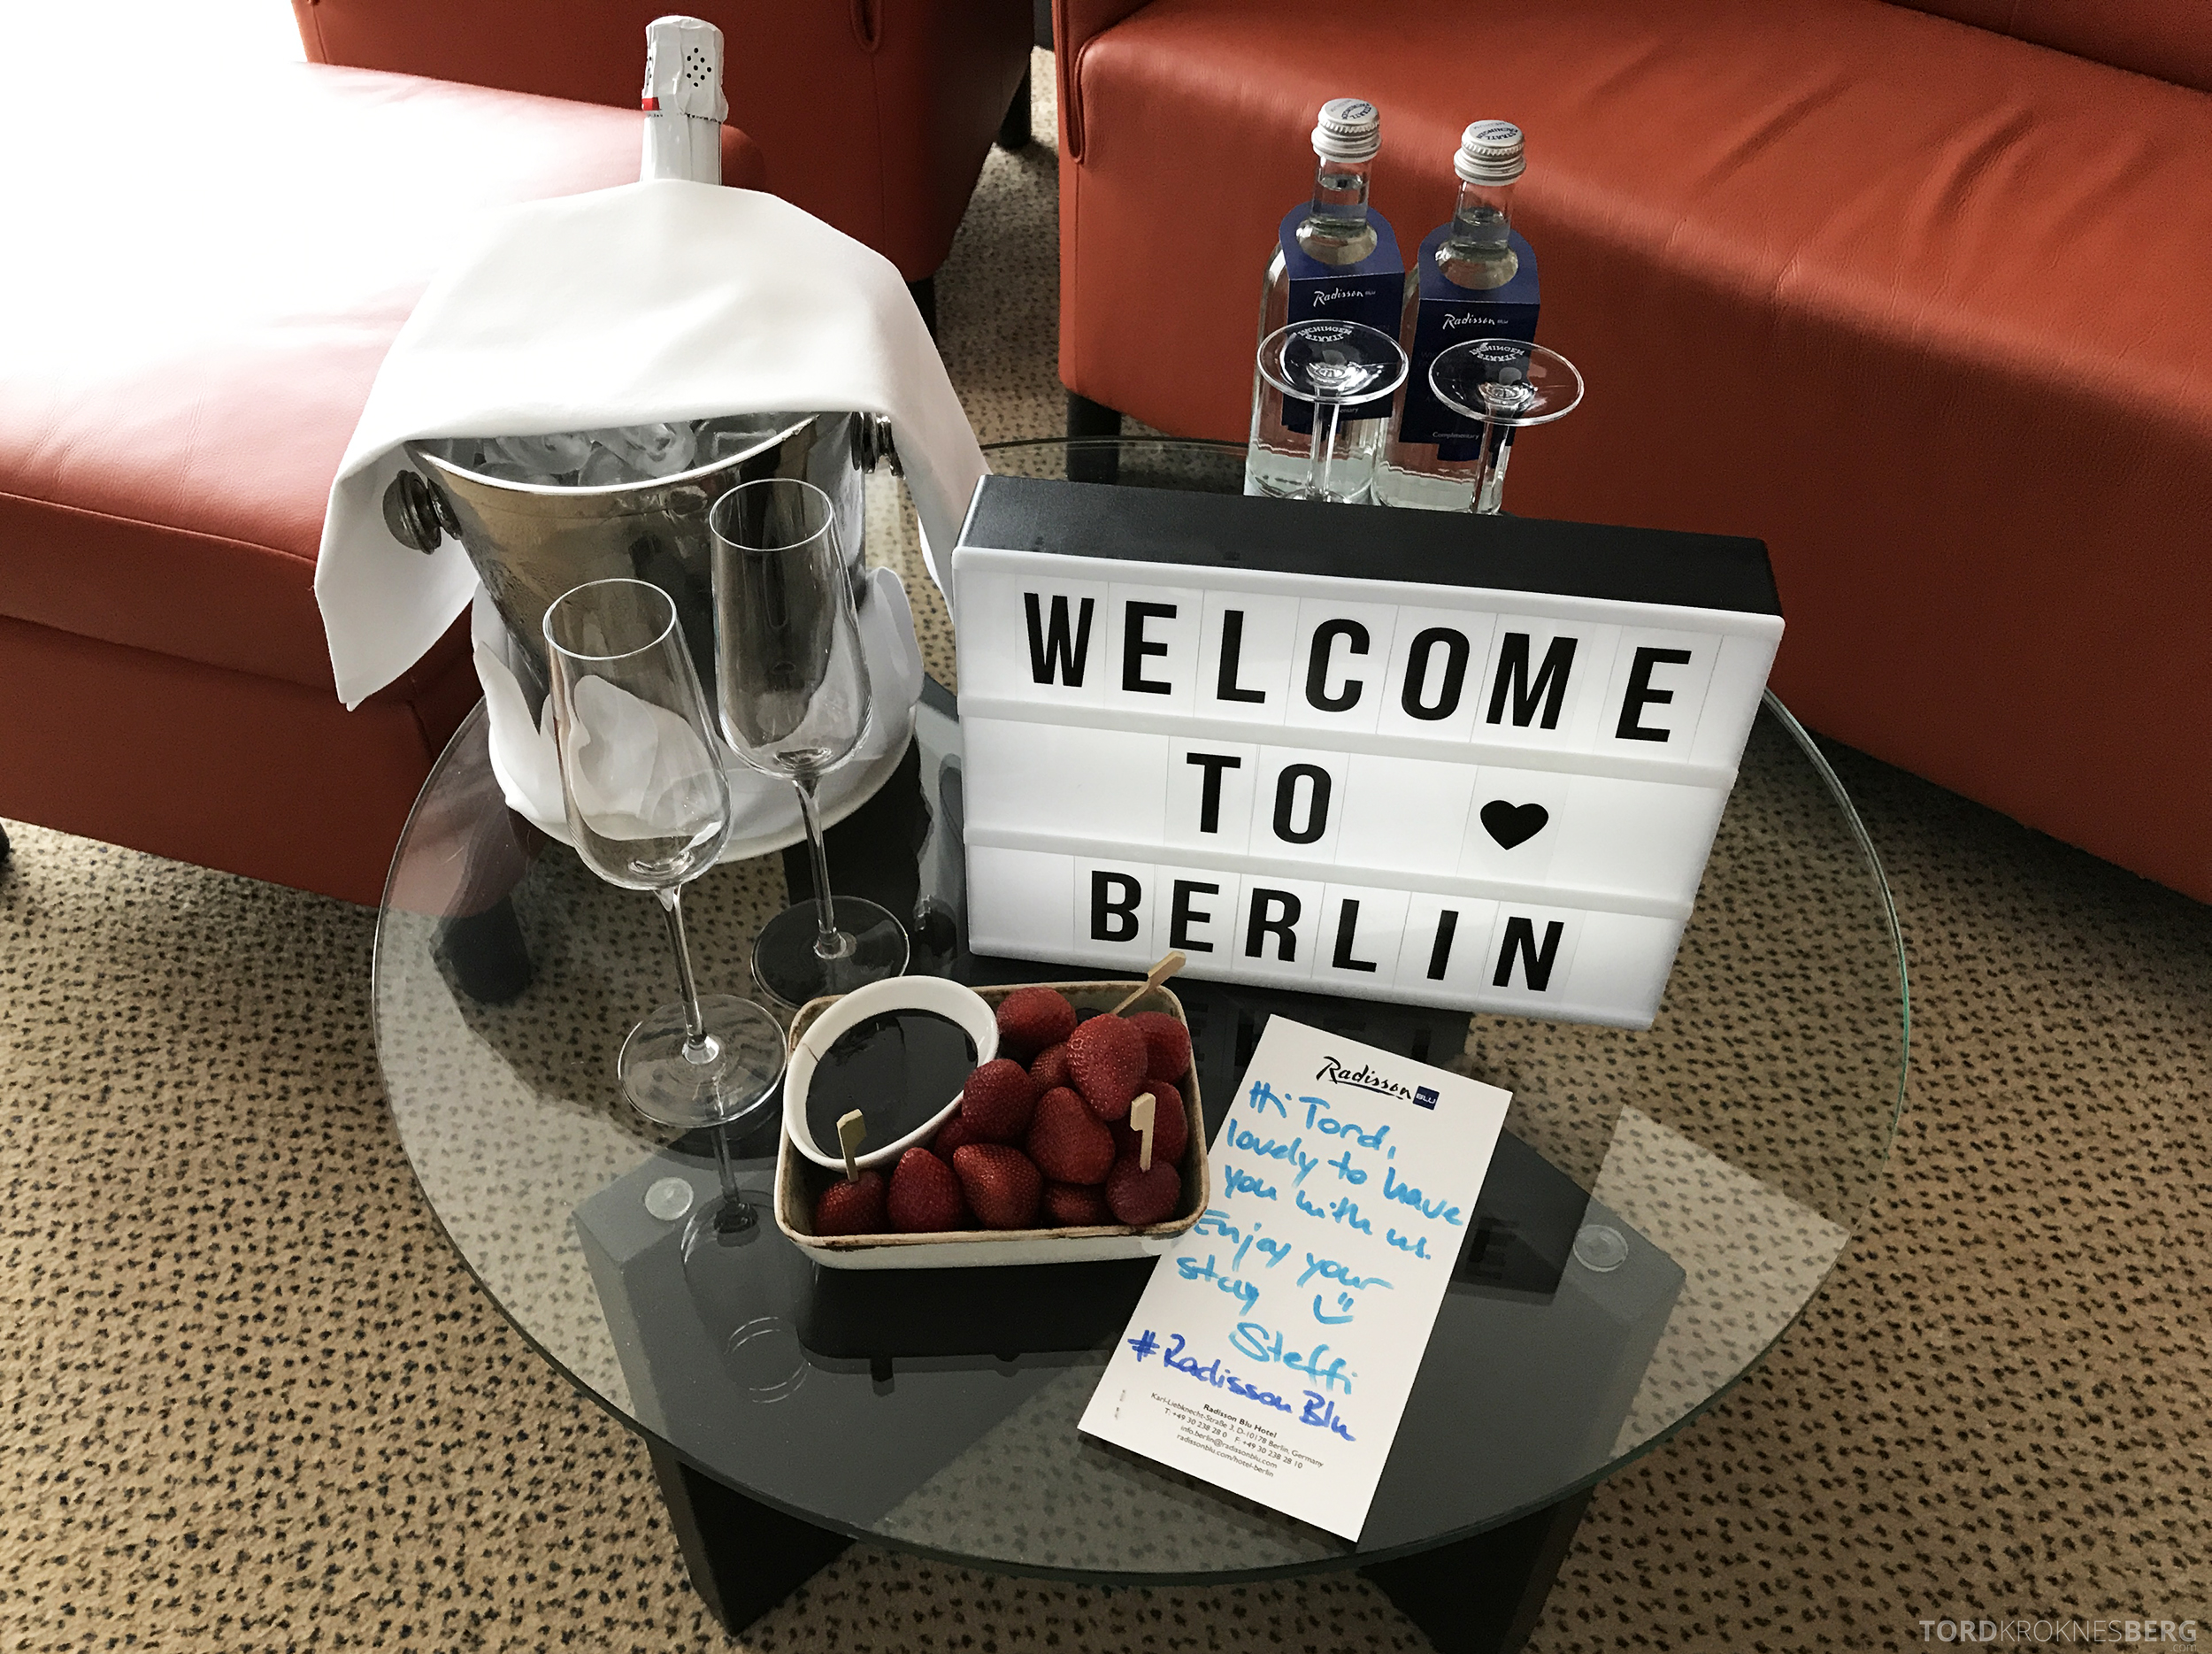 Radisson Blu Berlin velkomstgave